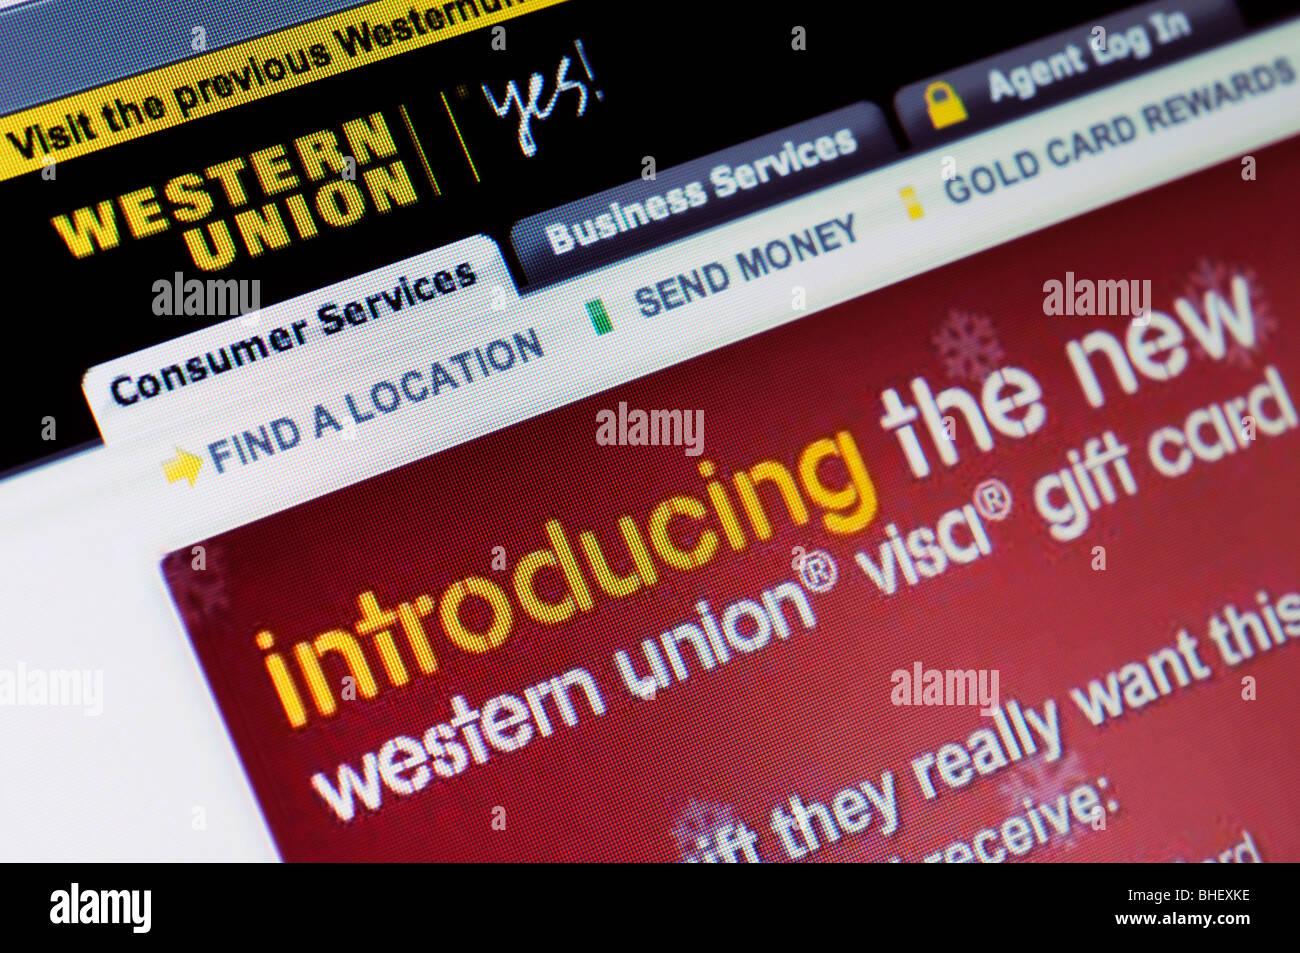 Western Union website - Stock Image